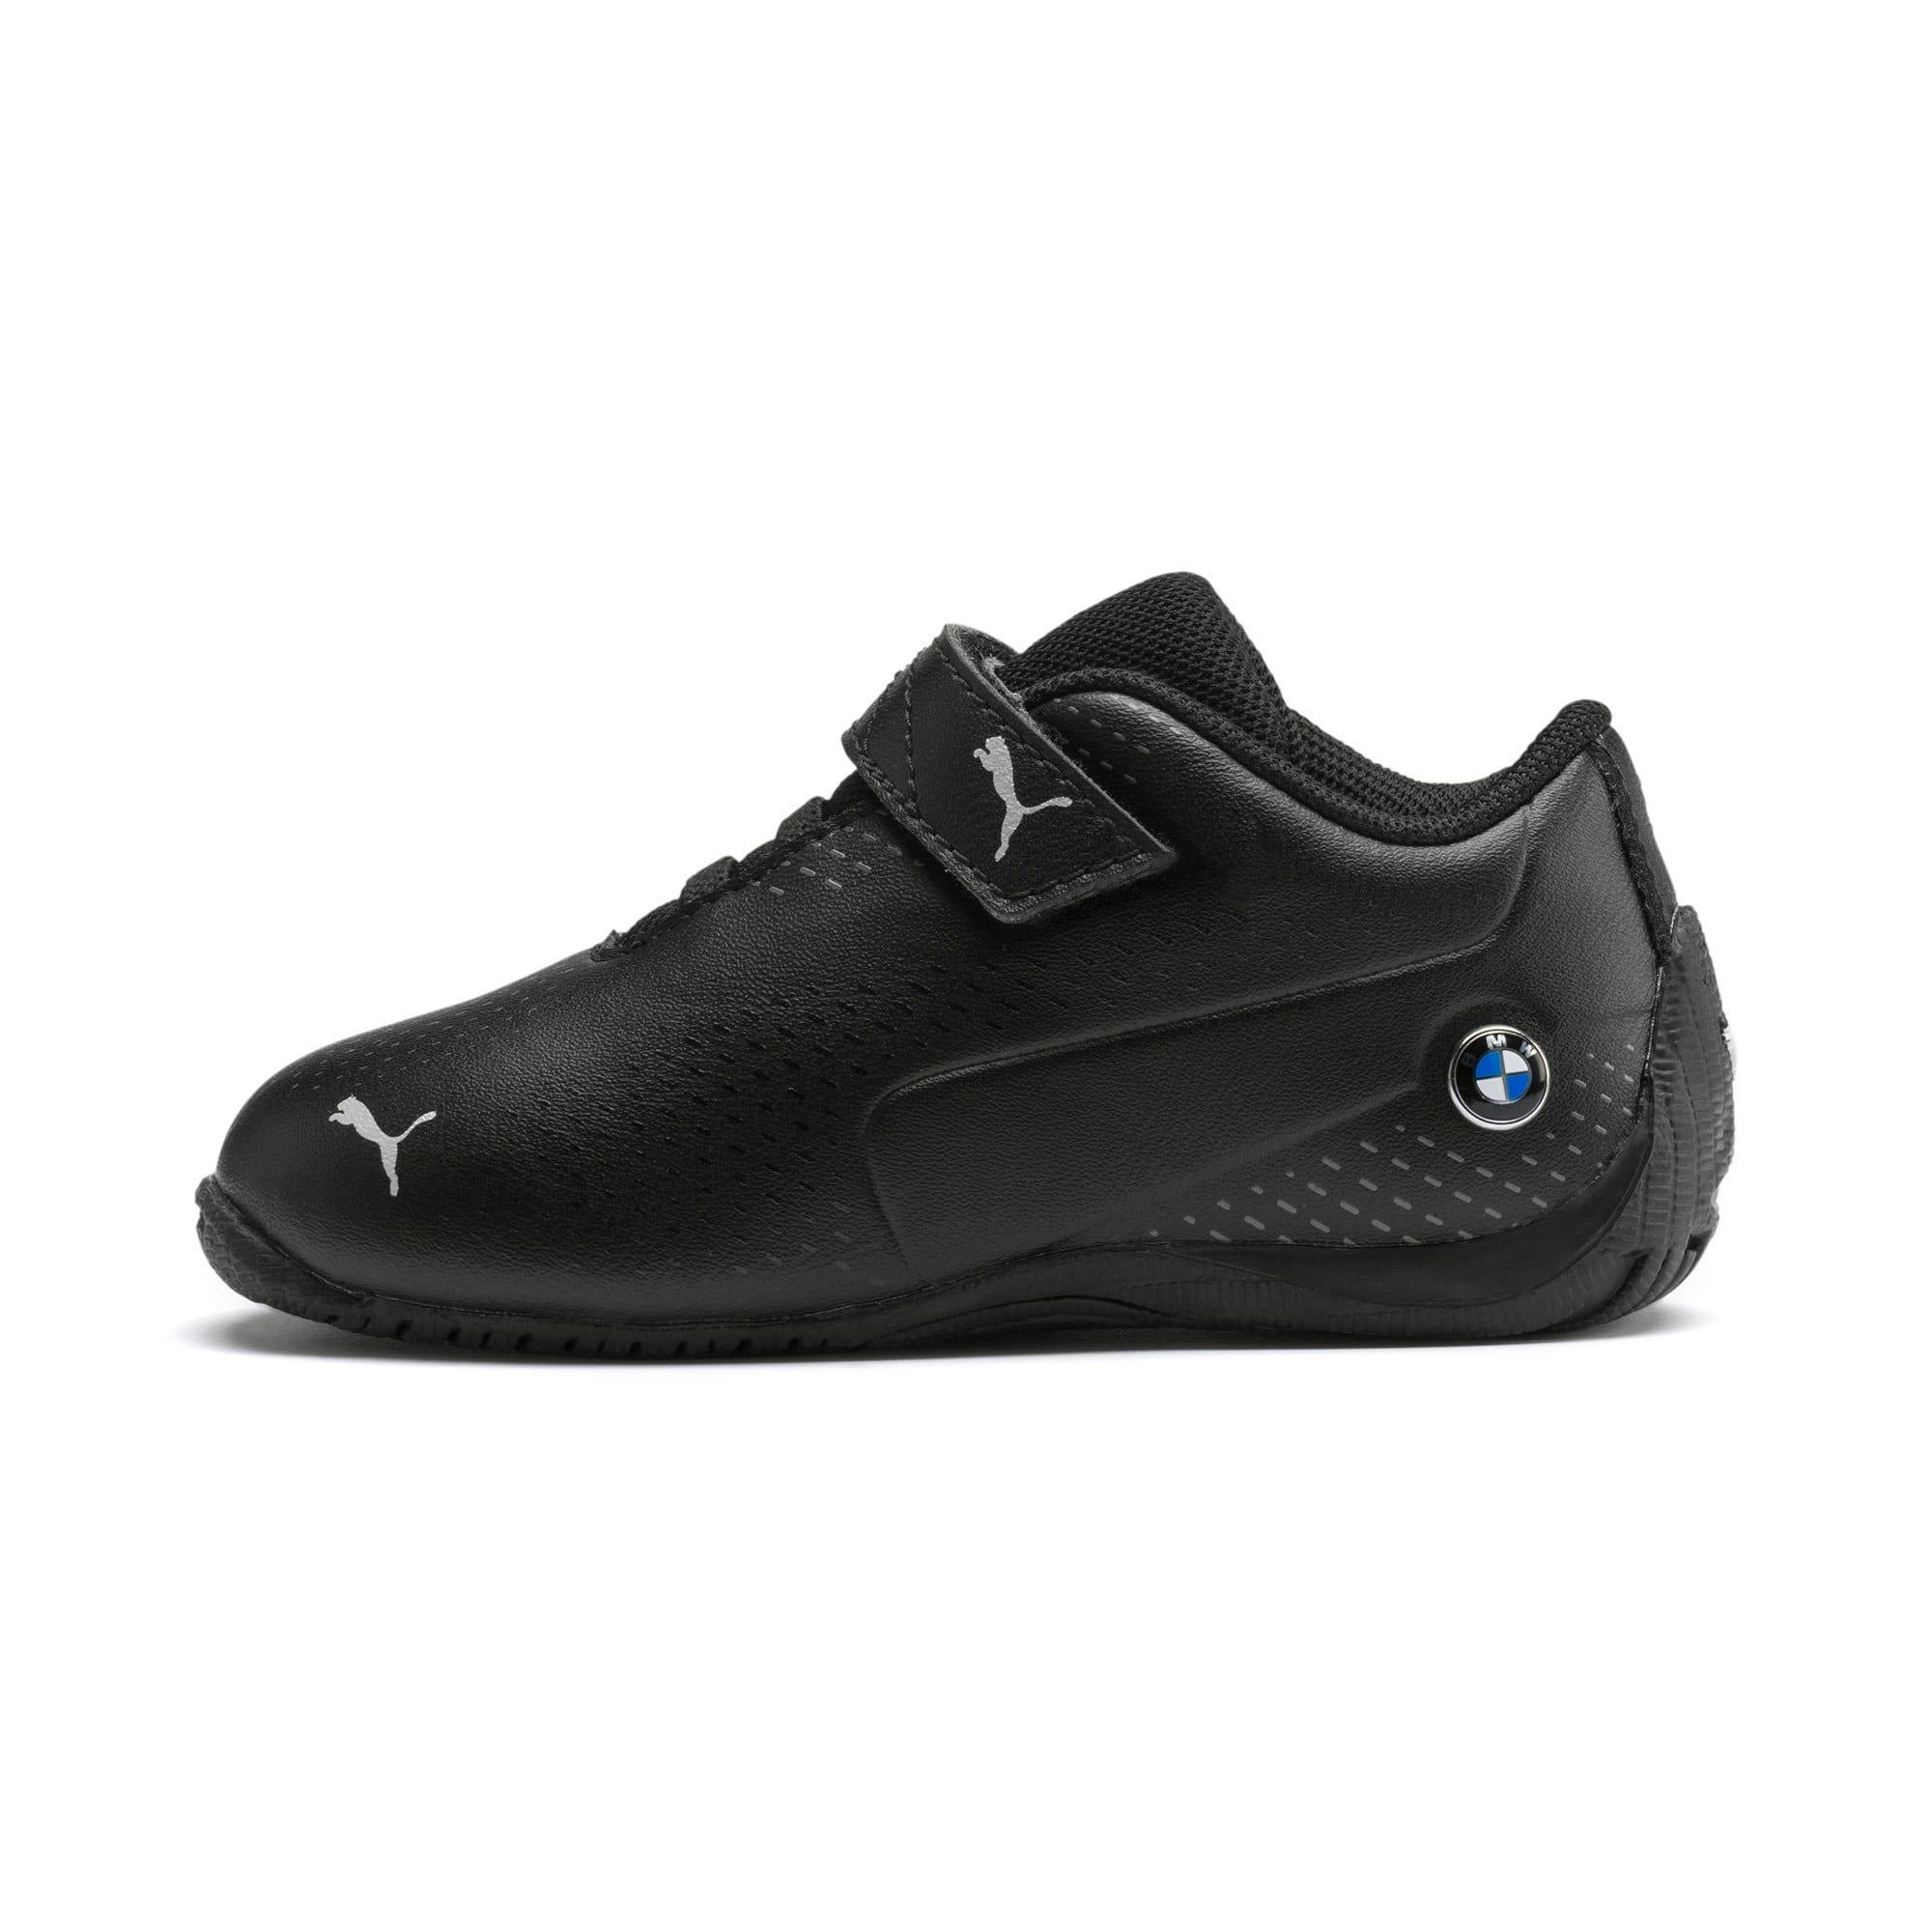 Thumbnail 1 of BMW M Motorsport Drift Cat 5 Ultra II Toddler Shoes, Puma Black-Puma Black, medium